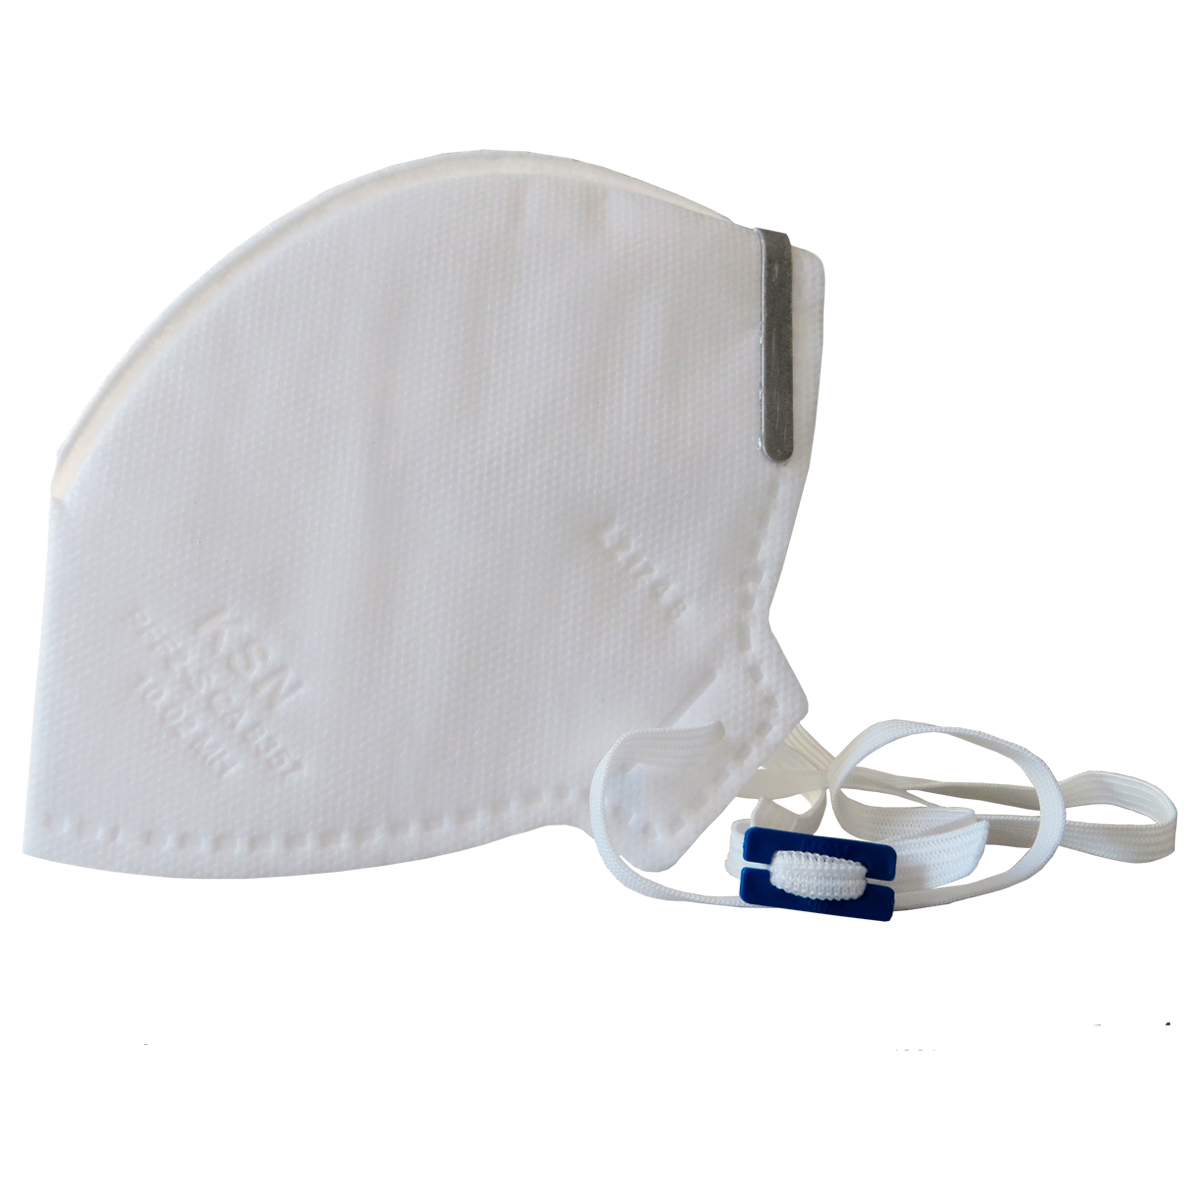 Máscara Semi-Descartável Hospitalar PFF2 N95 Branca - KSN